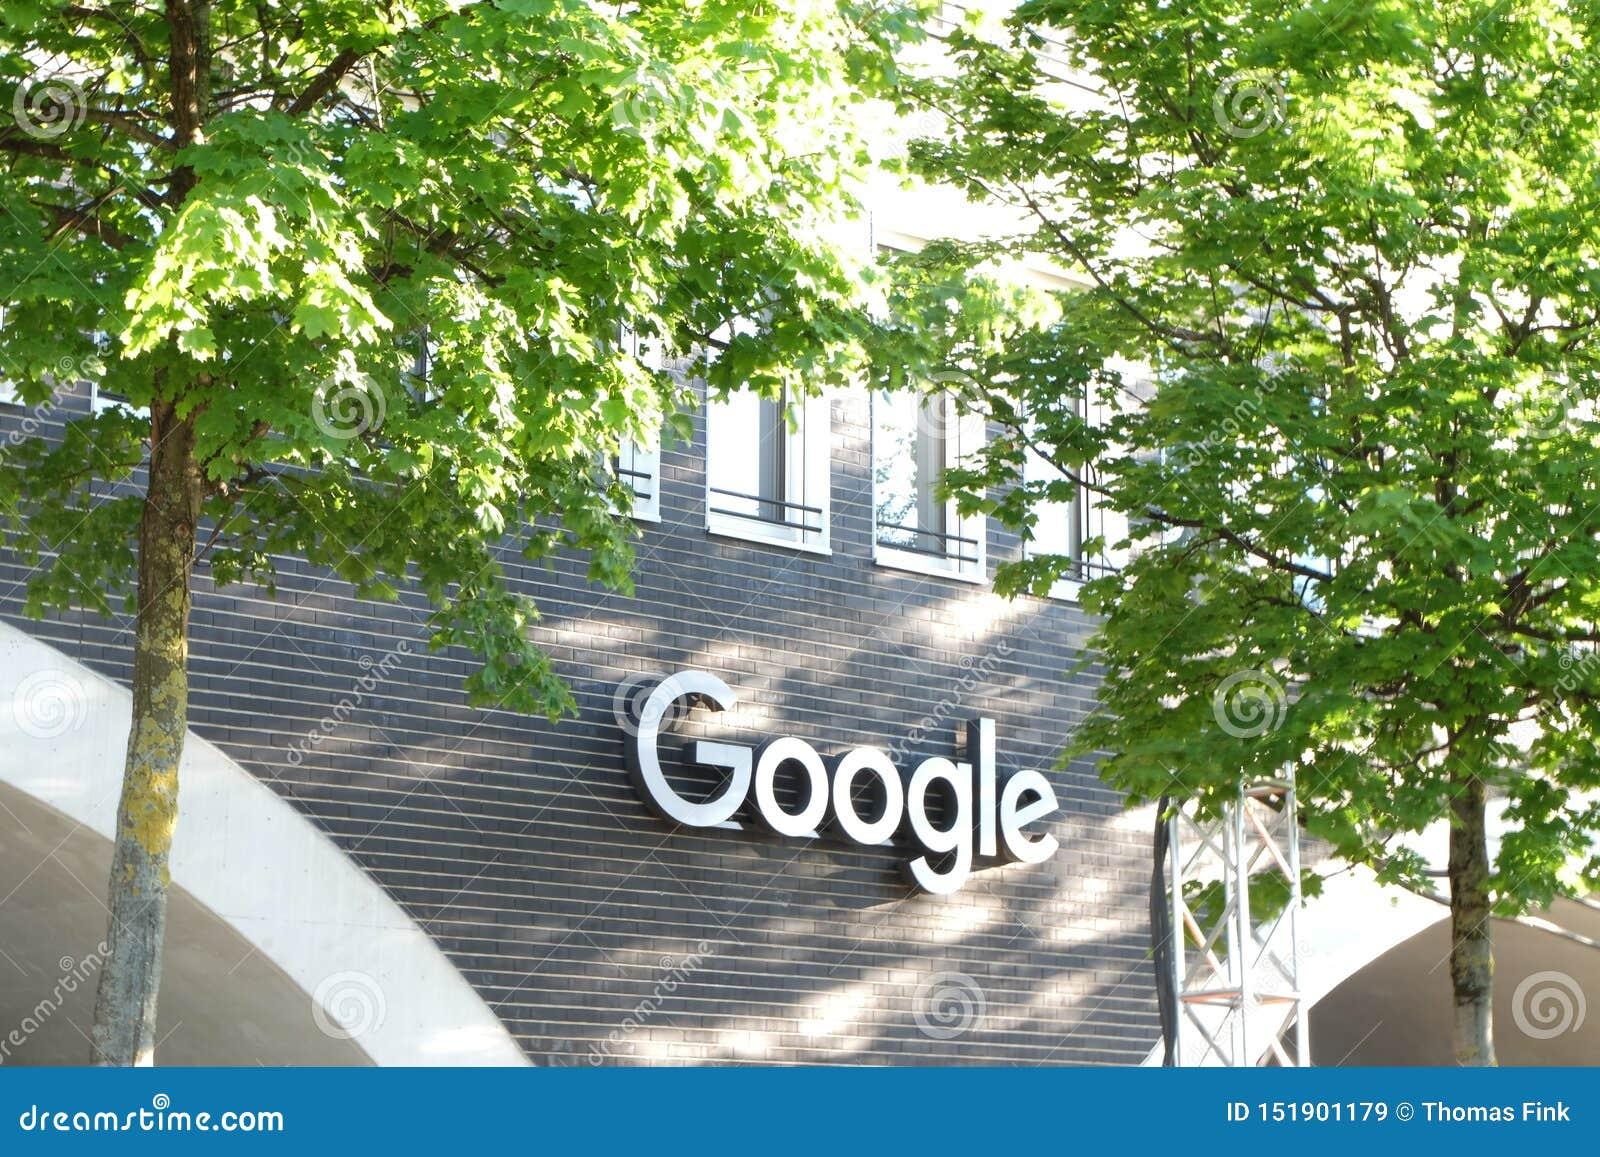 Google Office Building in Munich